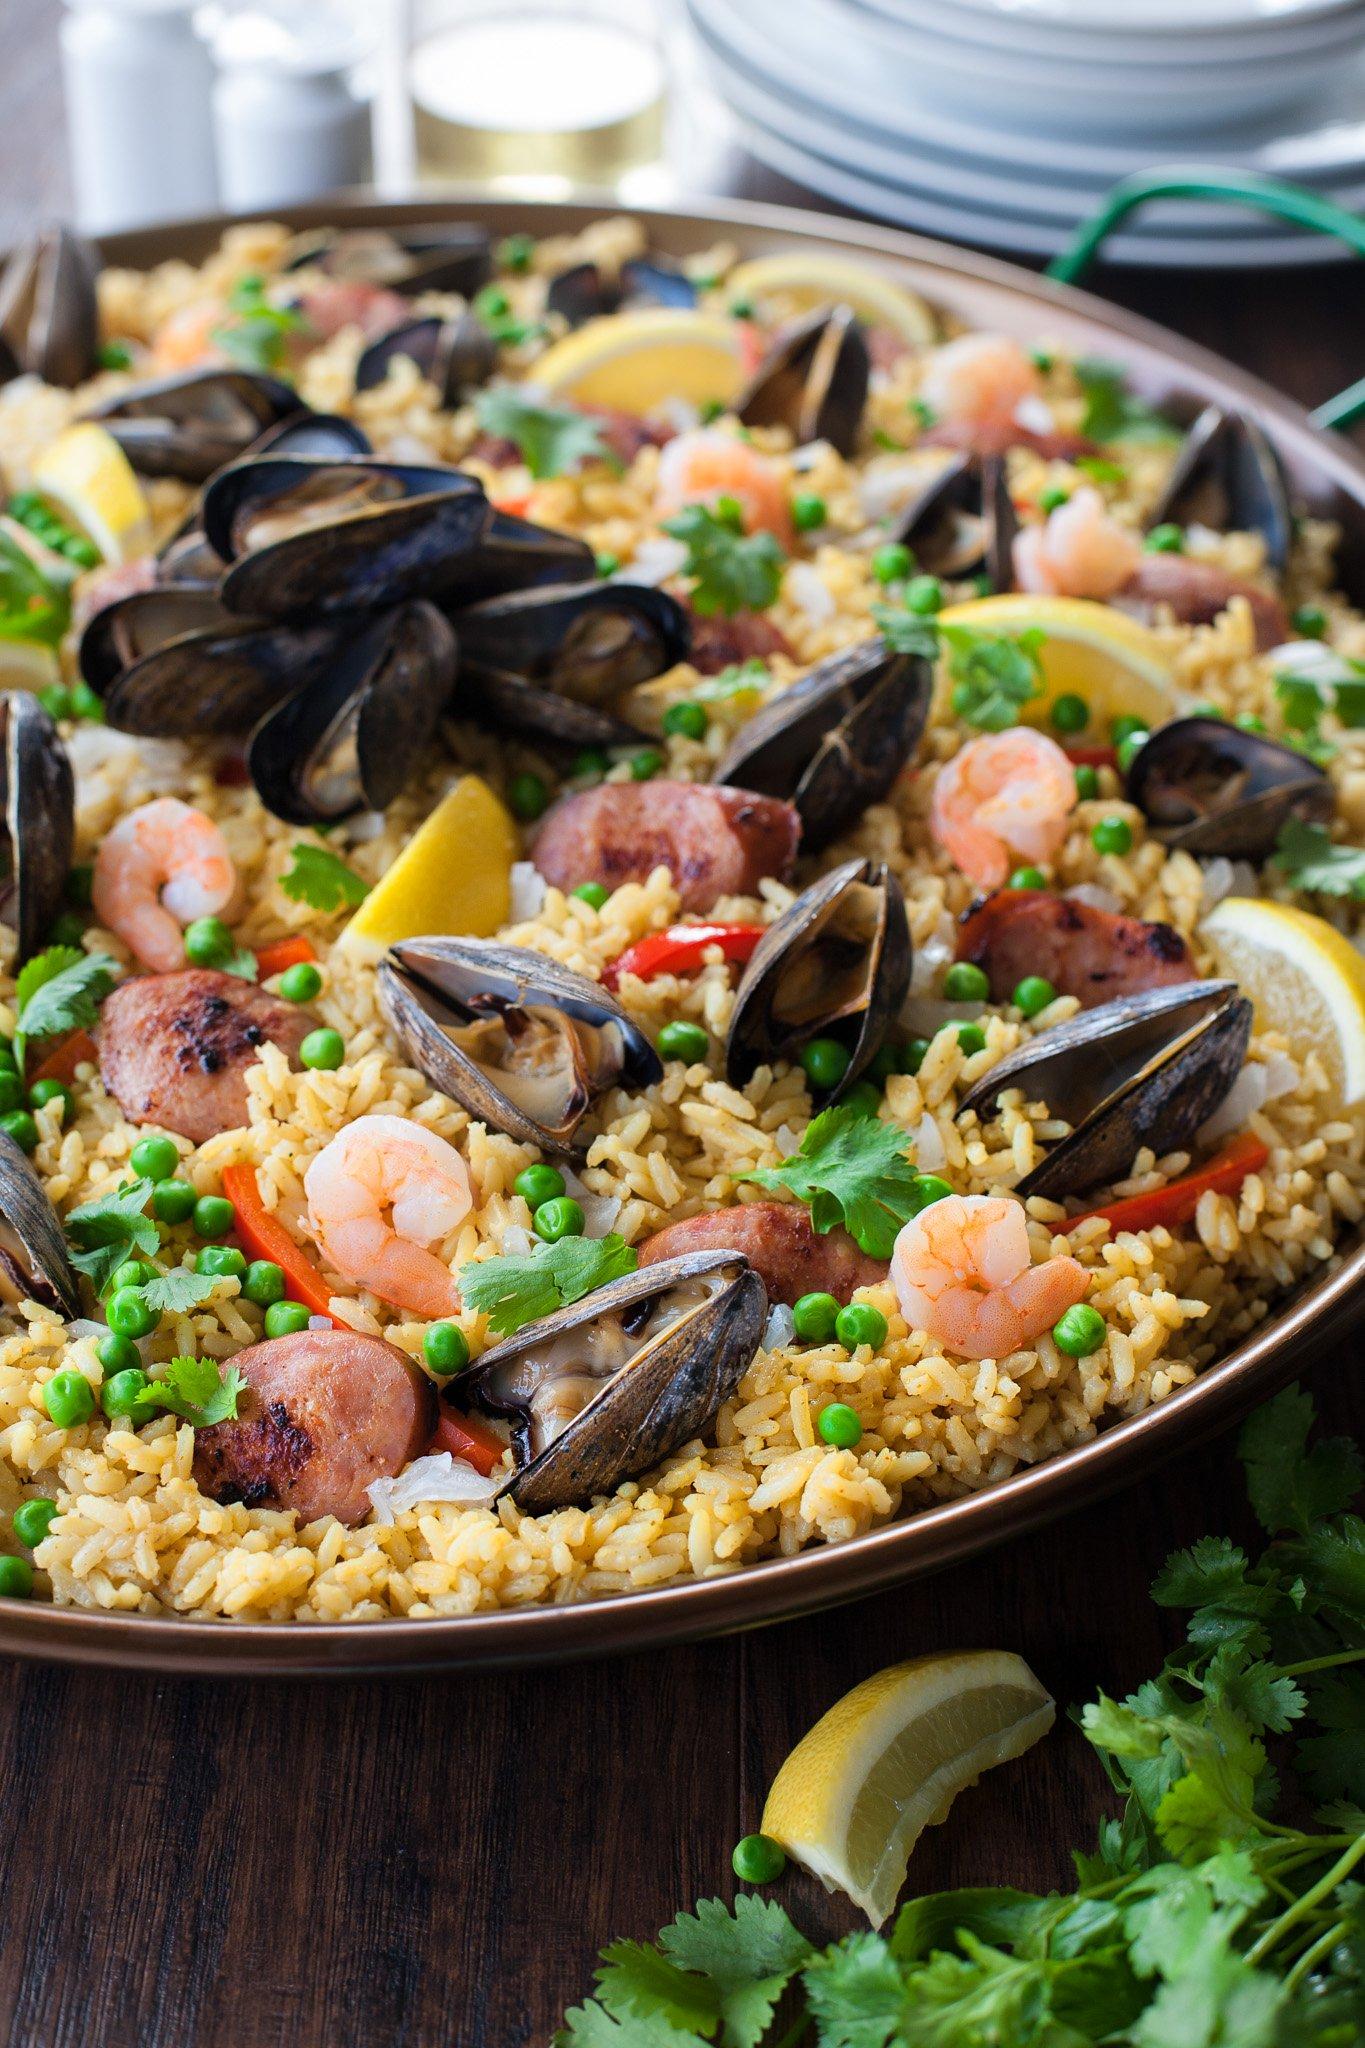 Paderno World Cuisine A4172447 Spanish Paella Pan 18 1/2in Gray by Paderno World Cuisine (Image #2)